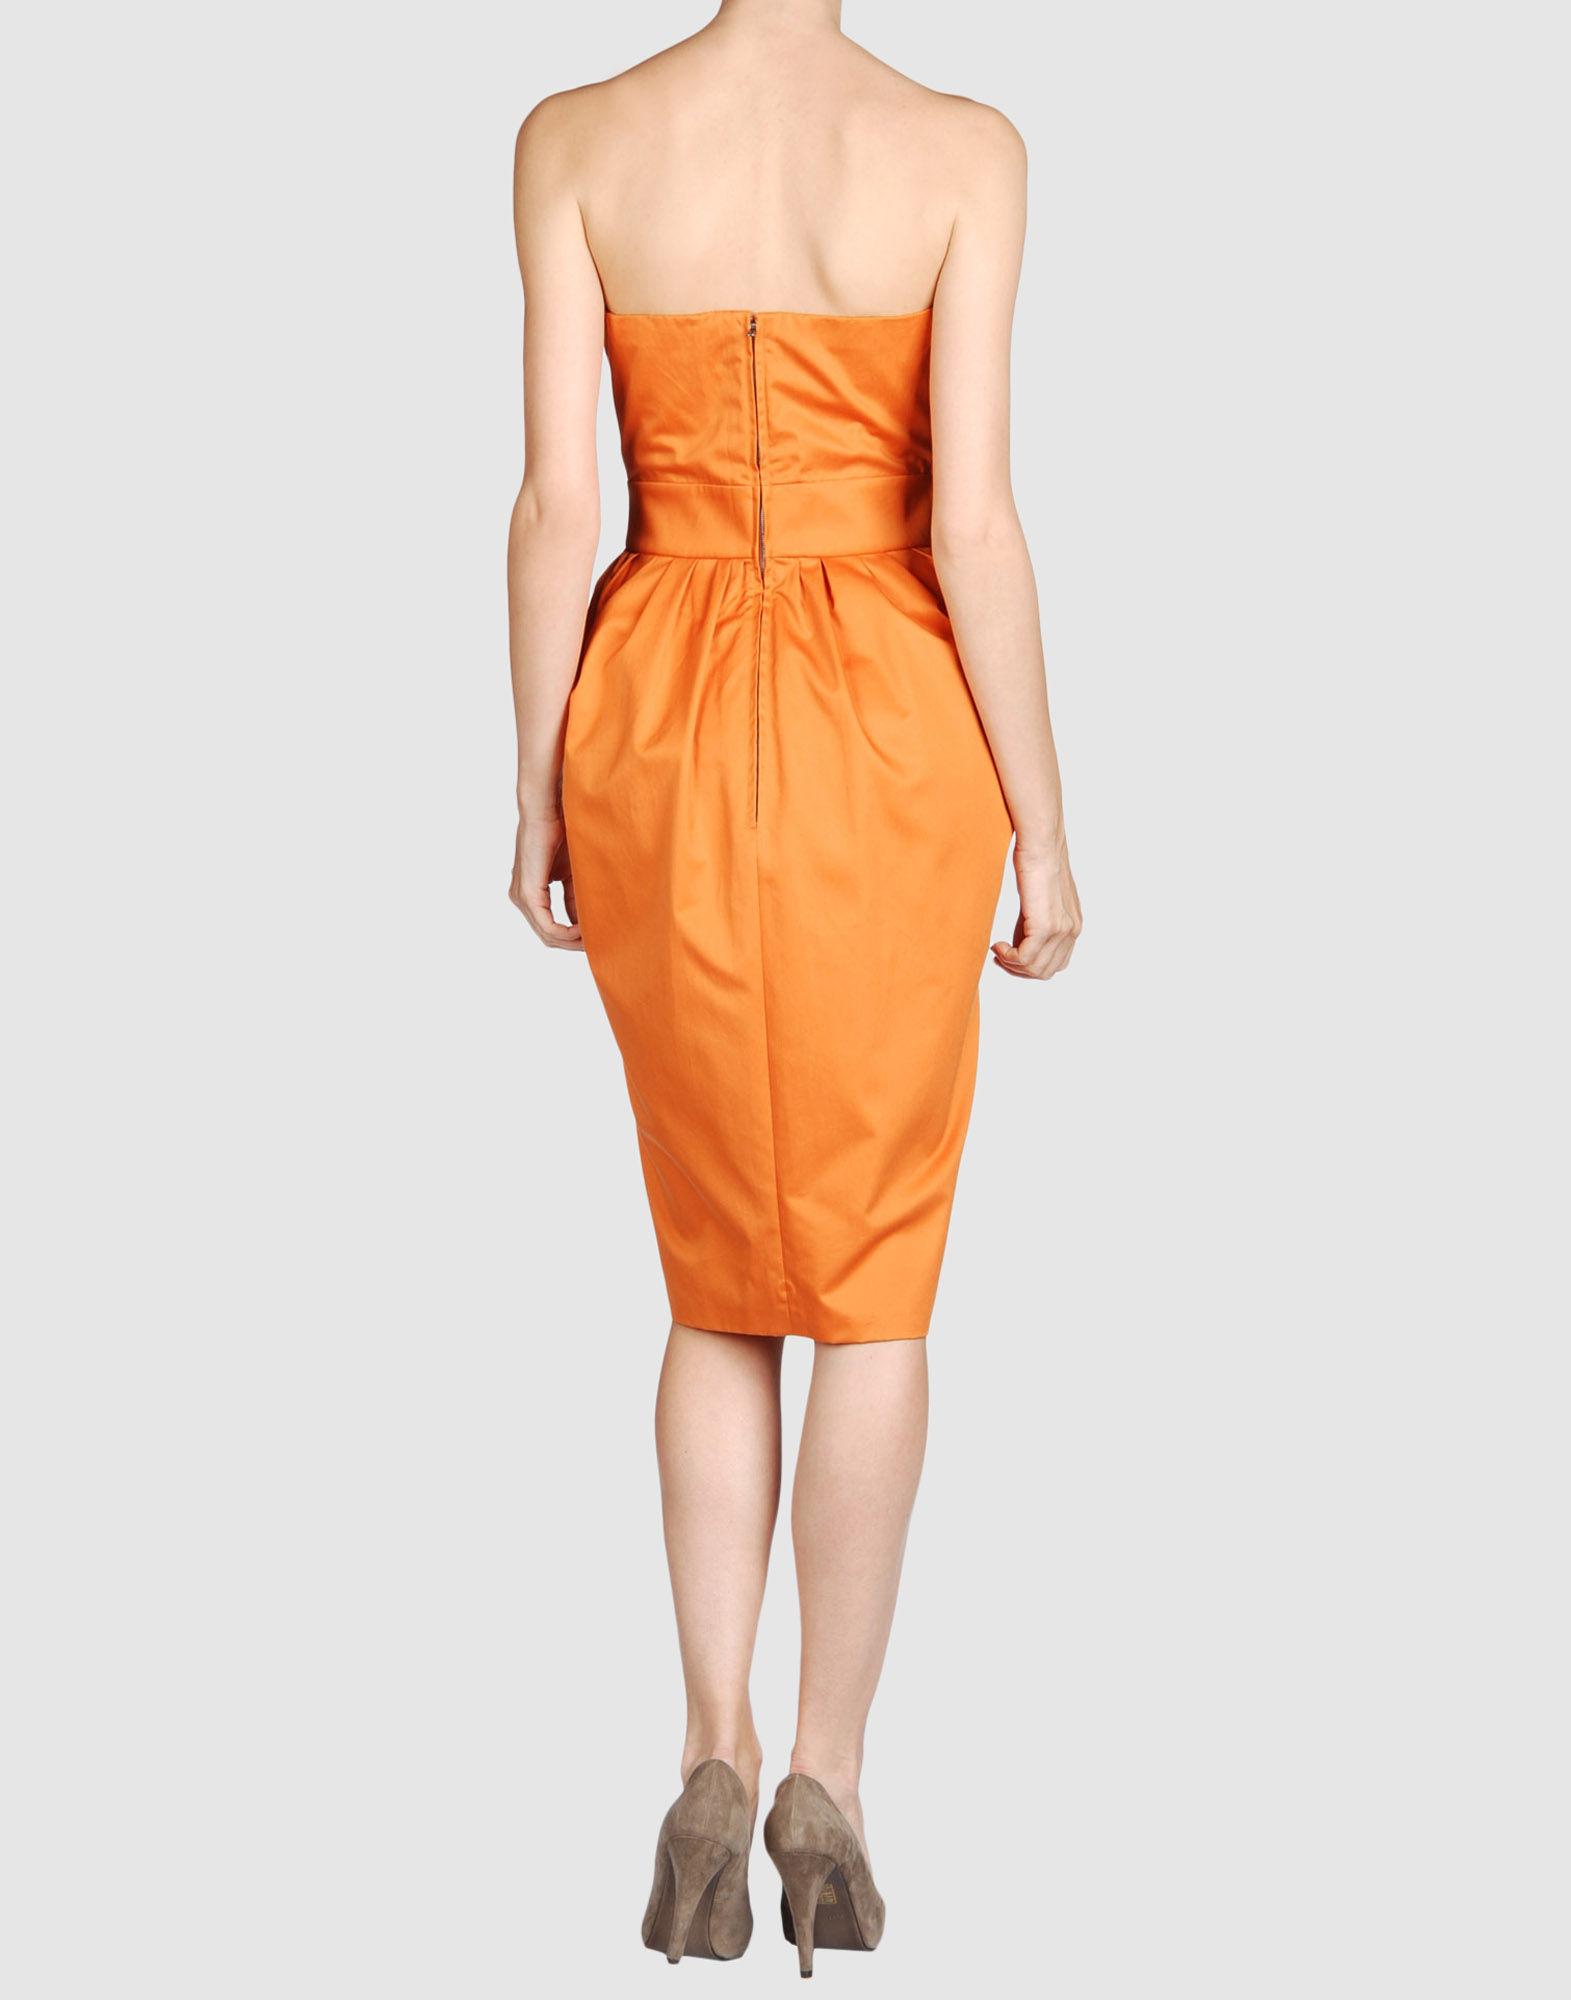 34220395UU 14 r - Βραδυνα Φορεματα Yves Saint Laurent Rive Gauche Κωδ.08